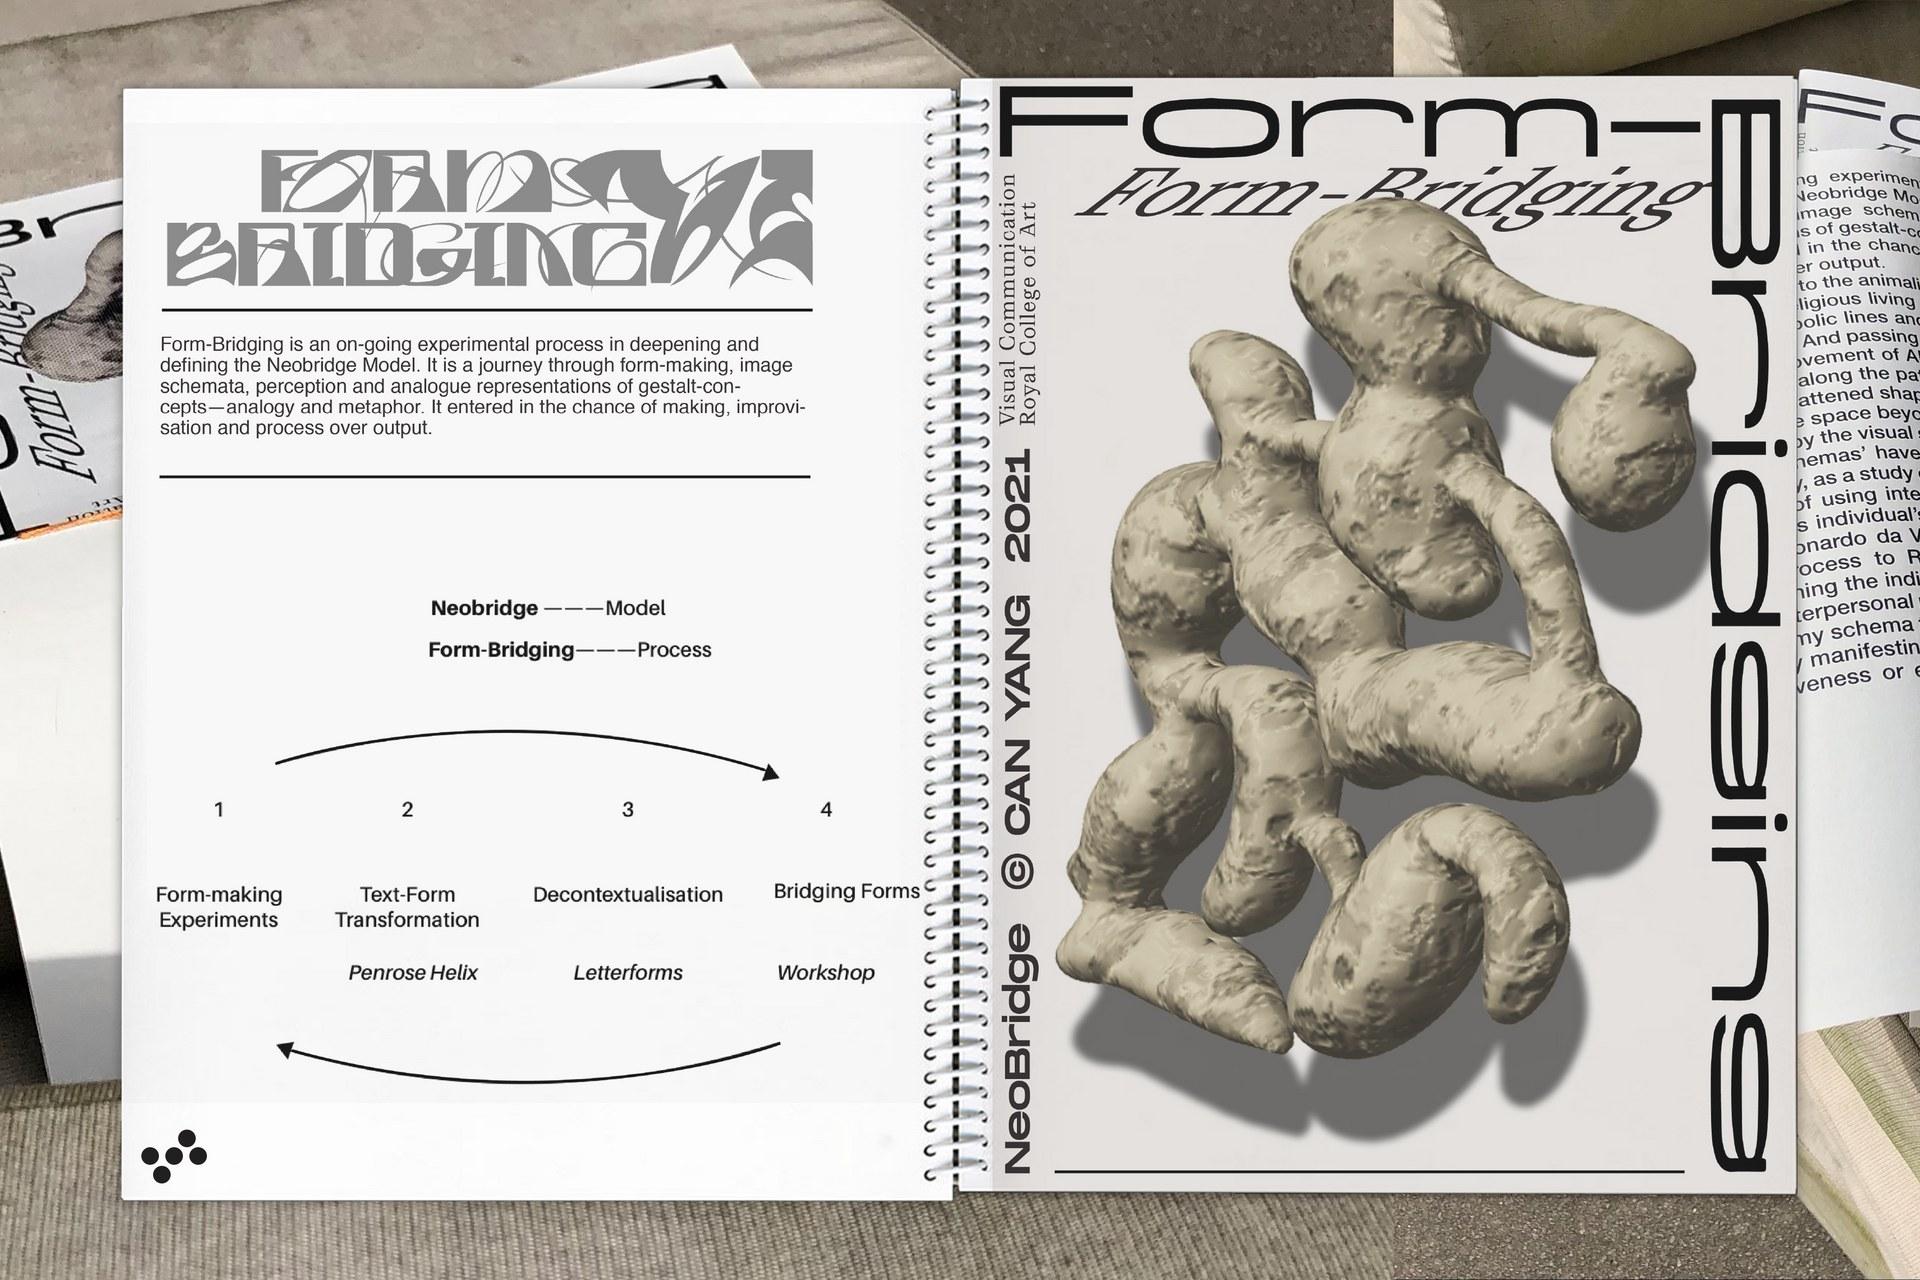 Form-bridging Independent Process 01.jpg